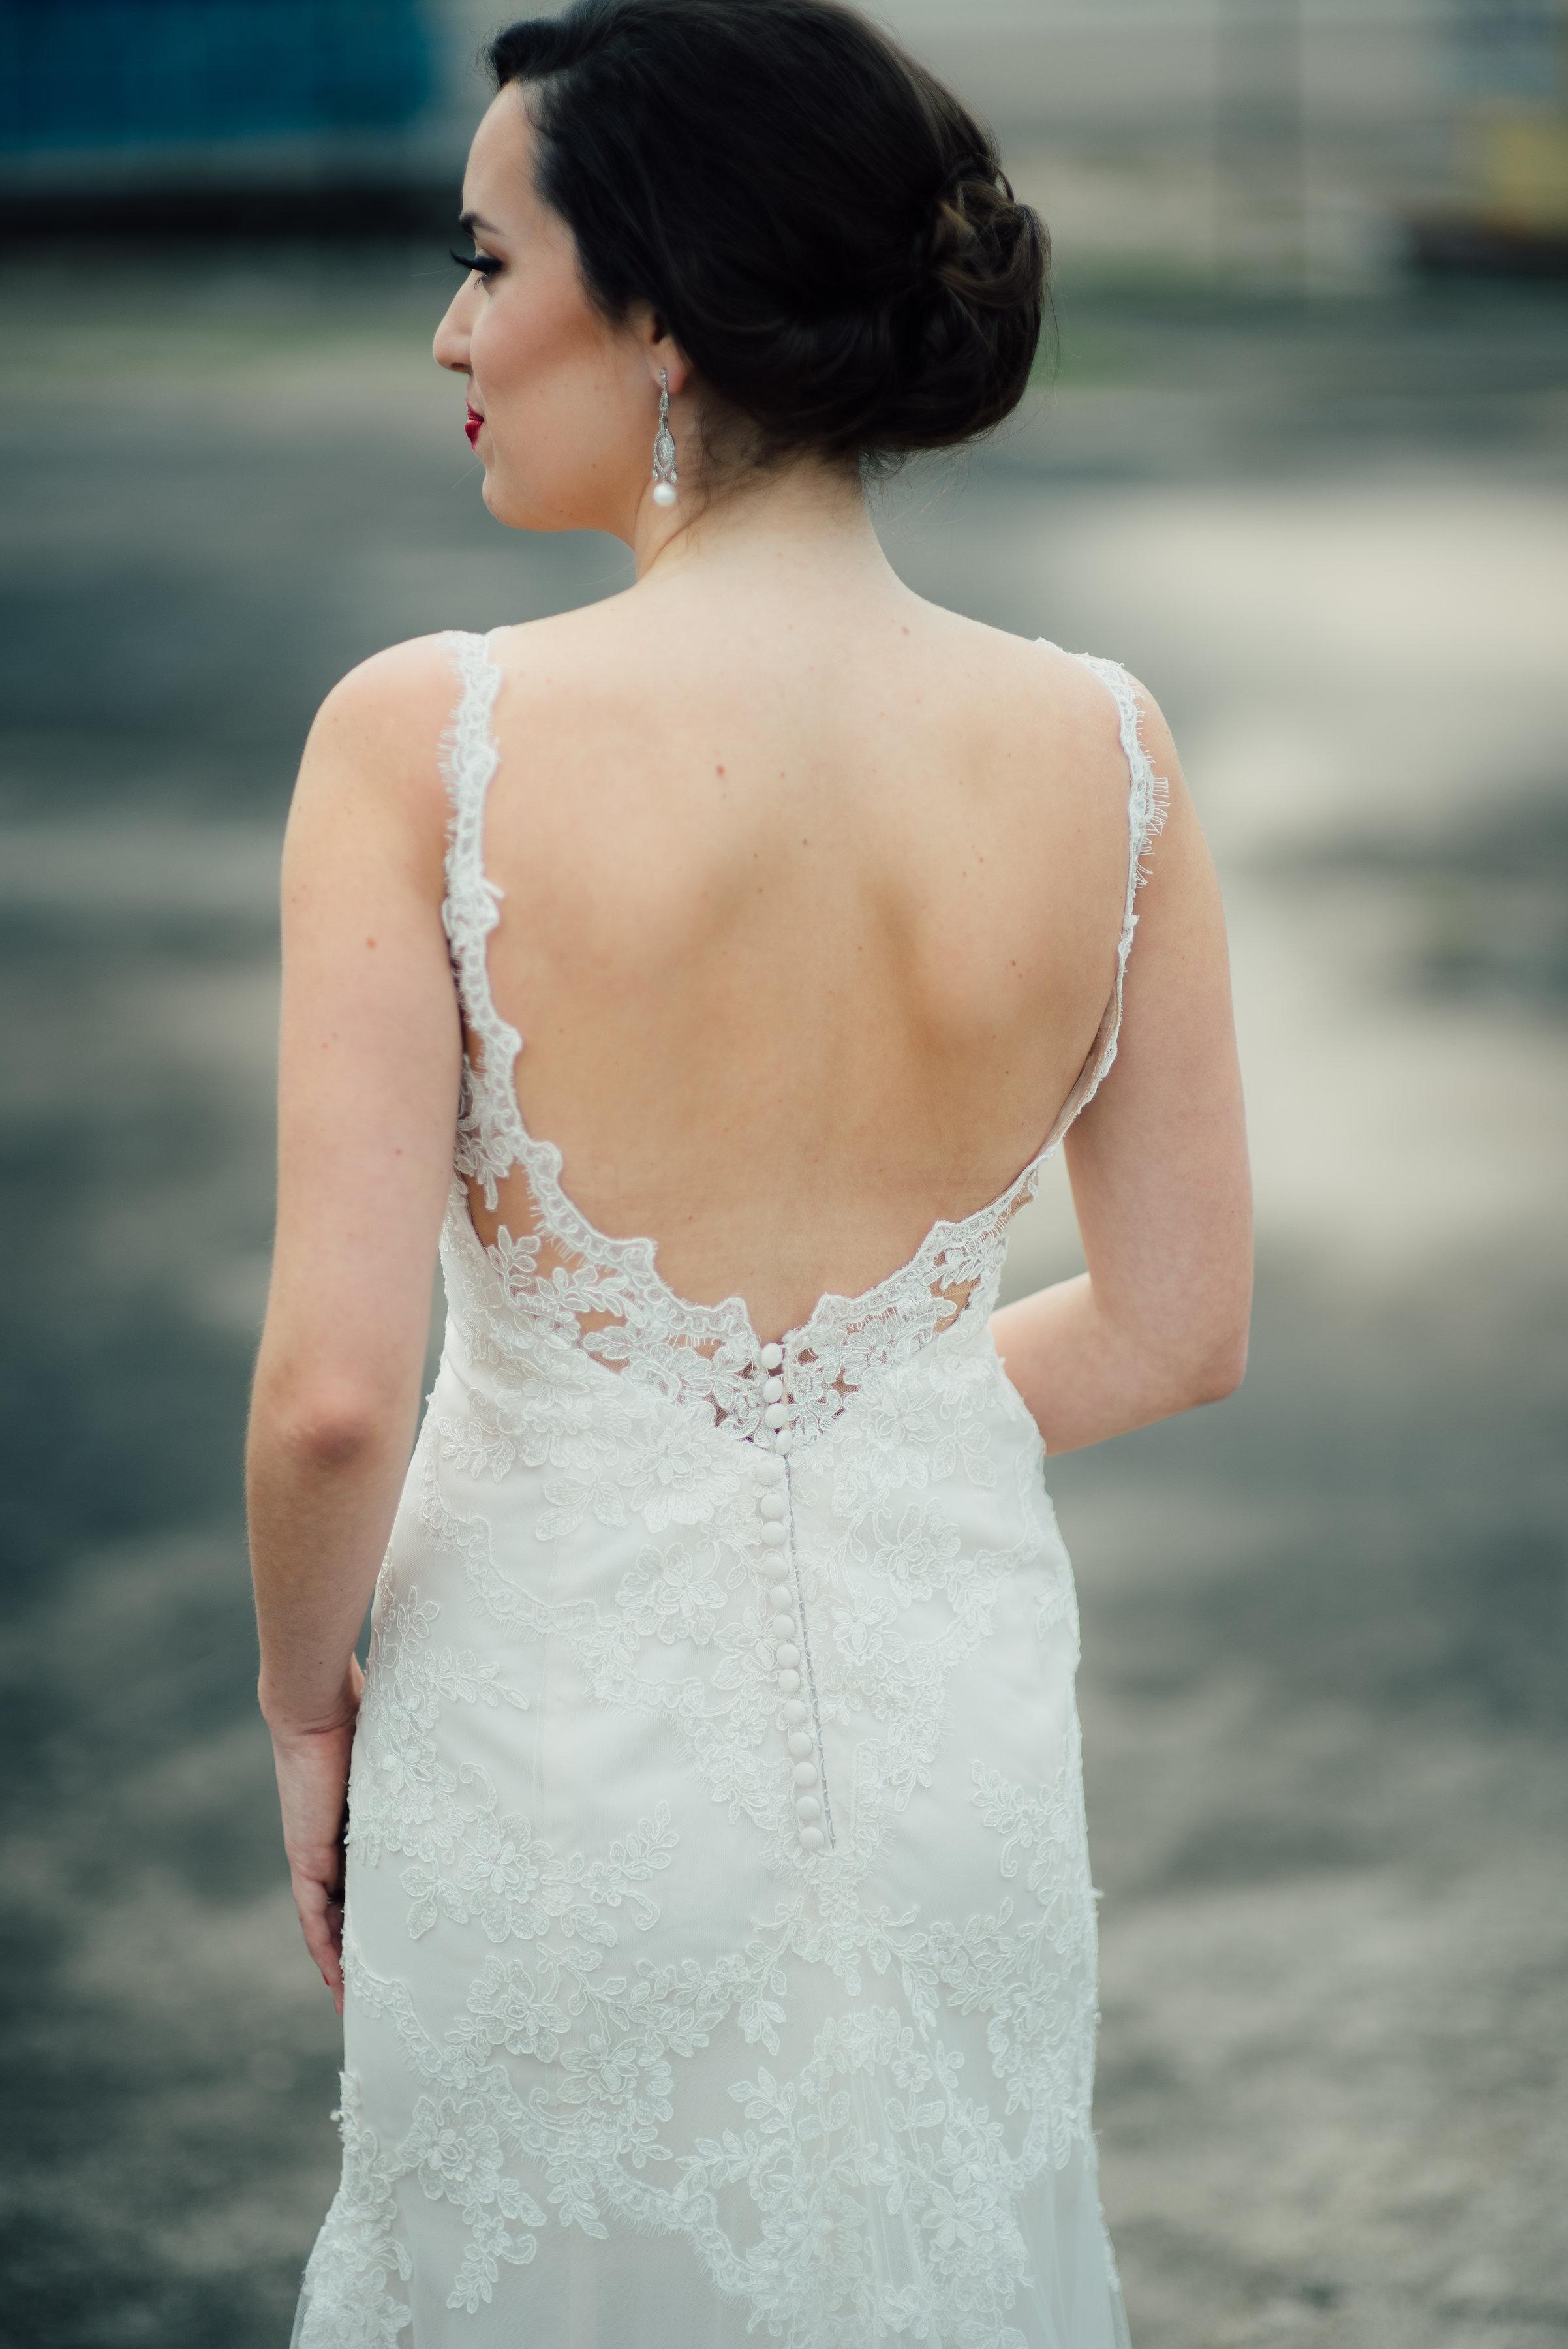 Lacey with a Low Back | Bridal Shop Houston TX | Whittington Bridal